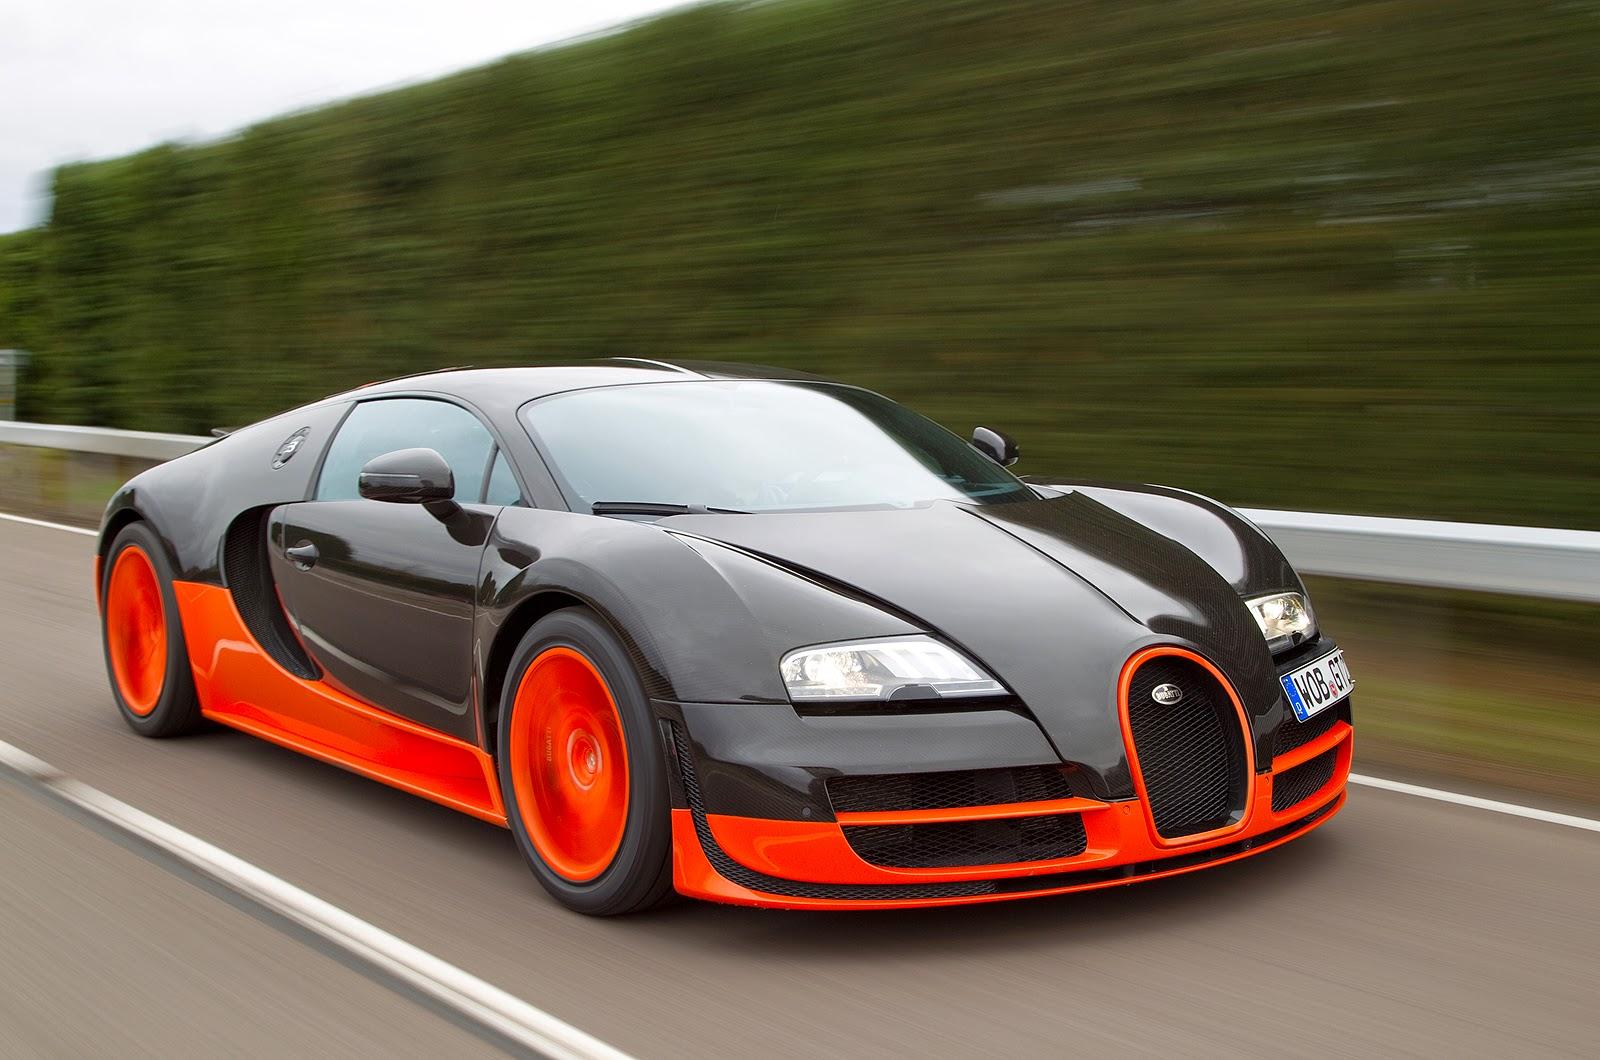 Bugatti Veyron Super Sports Mobil Paling Mahal Super Mewah 2015